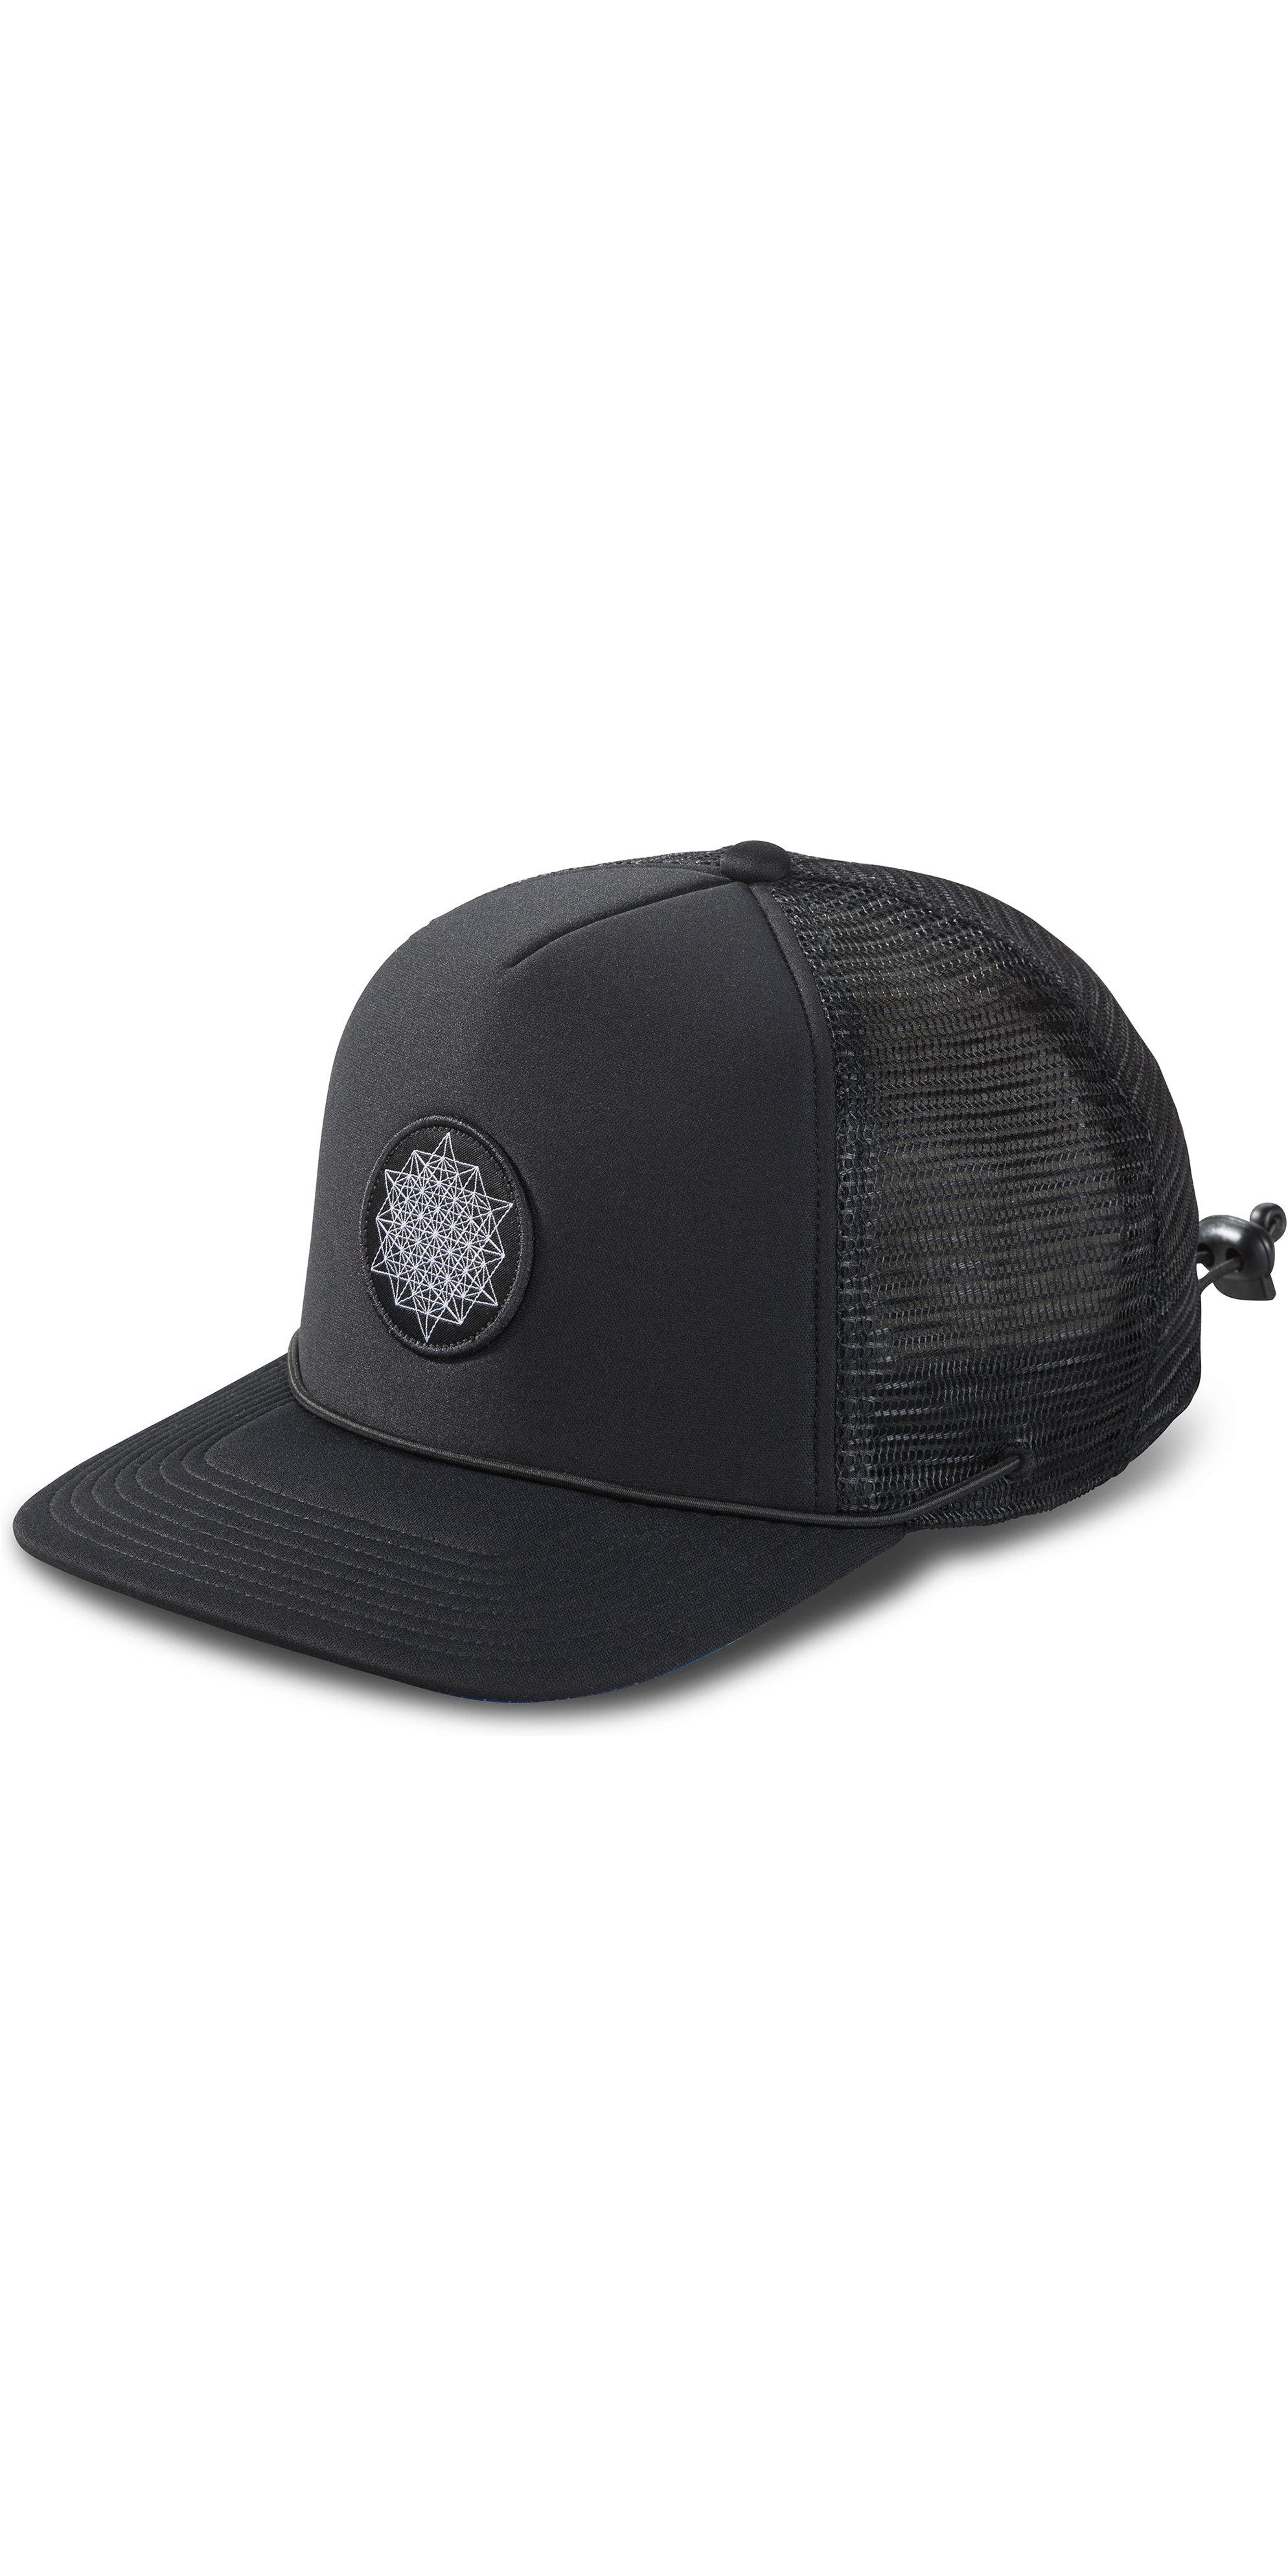 b99cf8f6c991f 2019 Dakine Kassia Lock Trucker Cap Black 10002468 - Accessories - Mens -  Clothing - by | Wetsuit Outlet